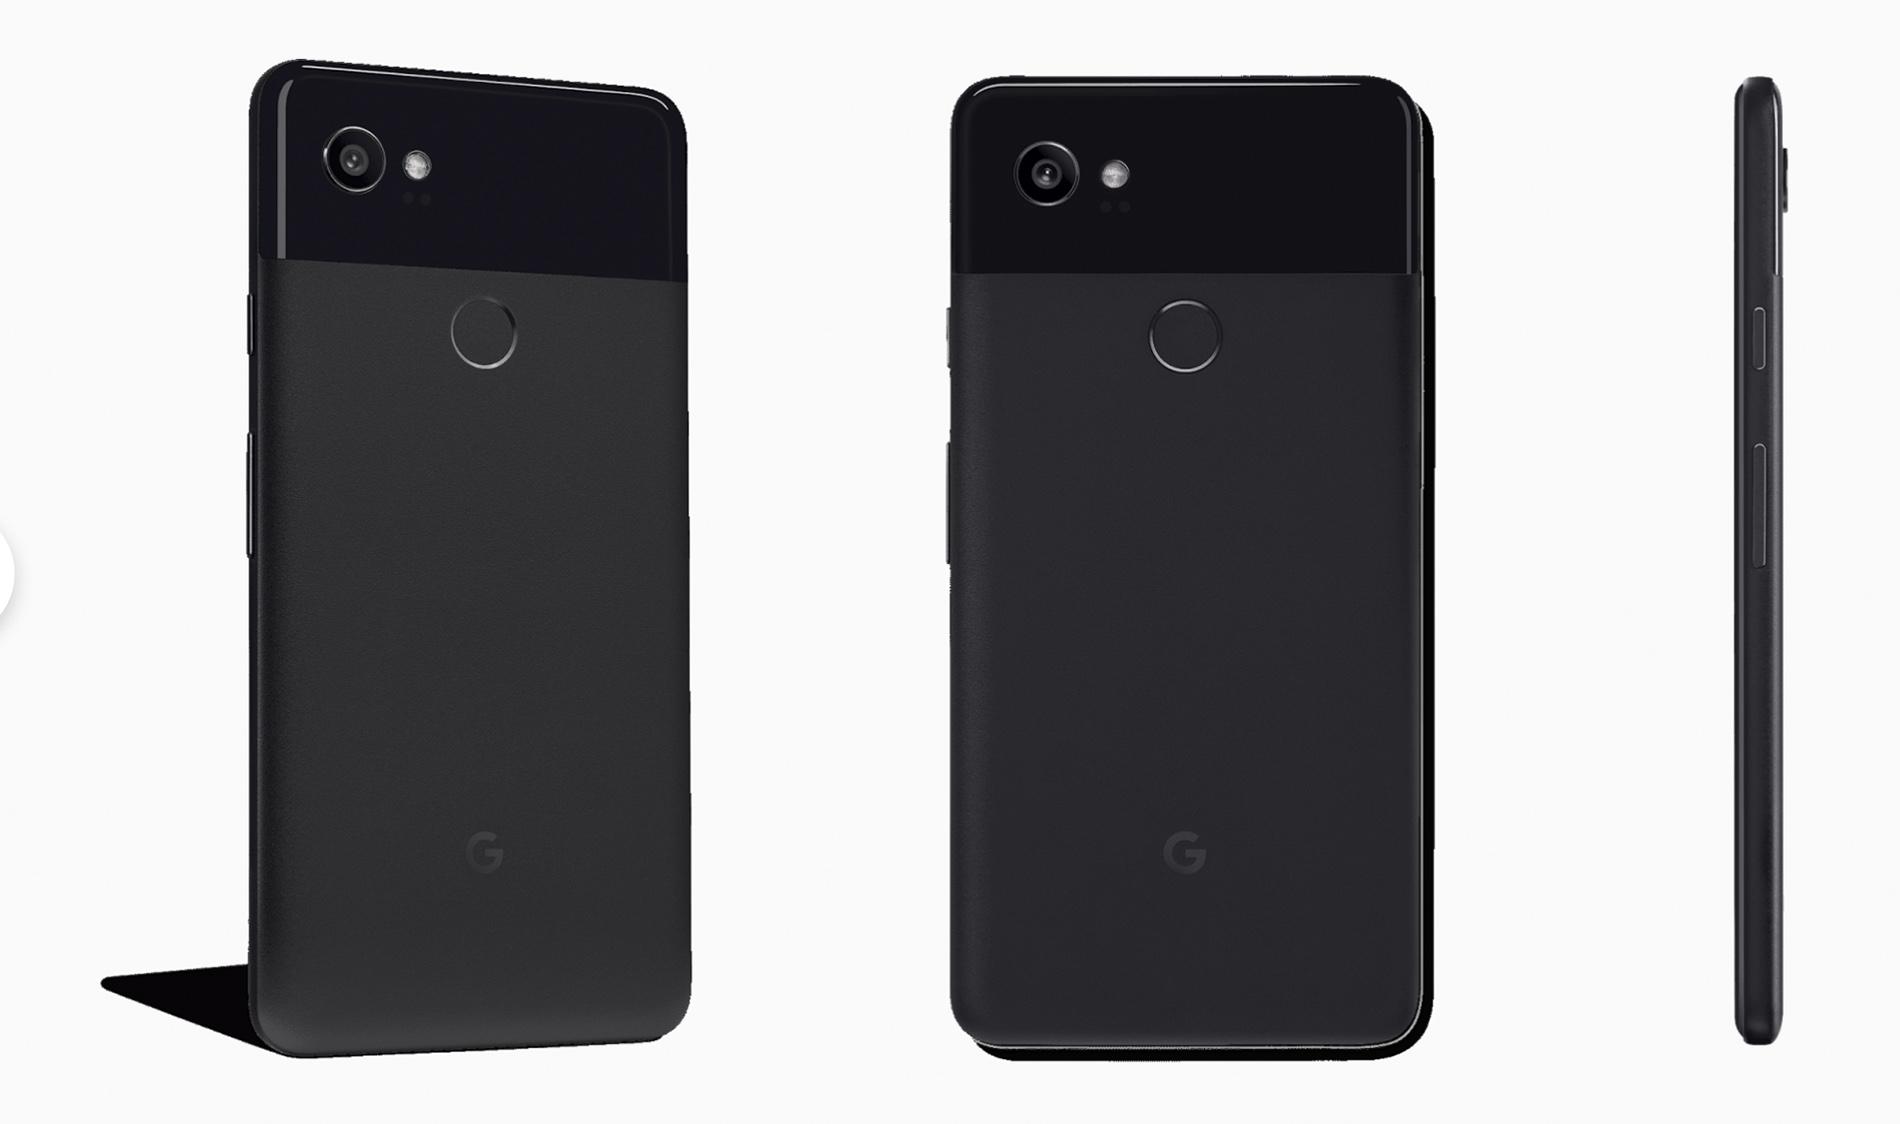 google s neue smartphones pixel 2 und pixel 2 xl navigation gps. Black Bedroom Furniture Sets. Home Design Ideas